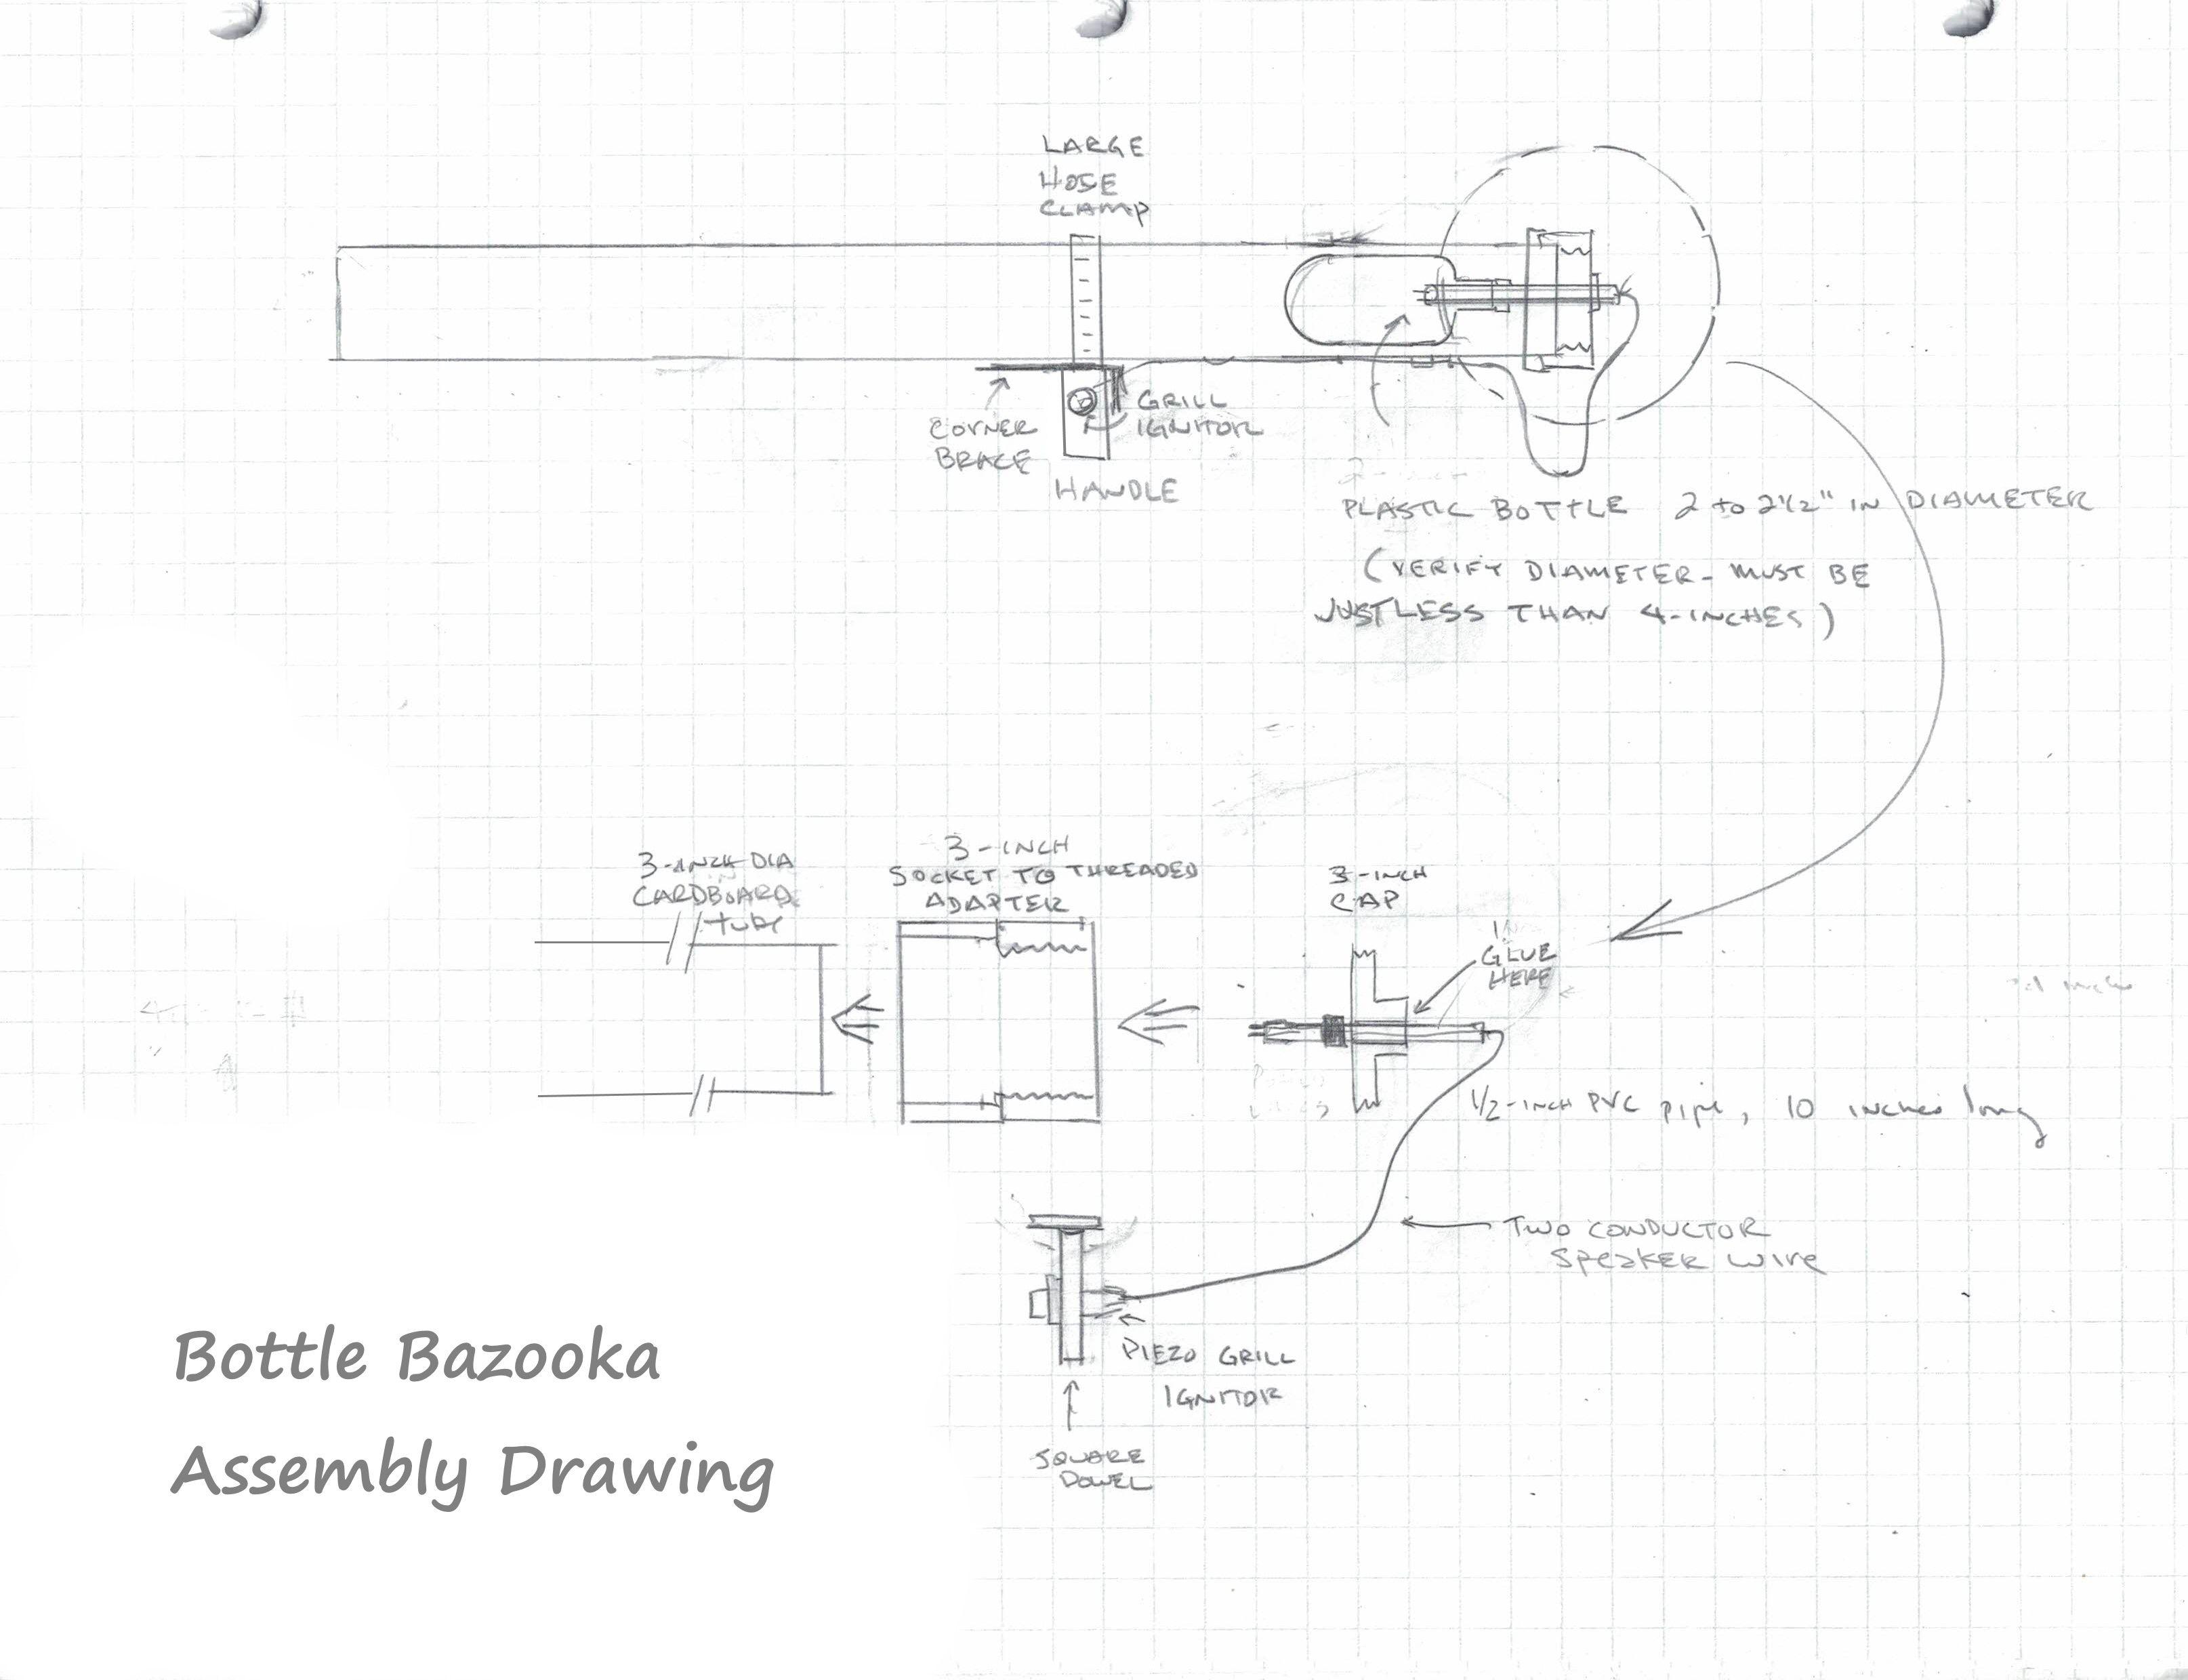 I Defend My Backyard With A Bottle Bazooka | Popular Science